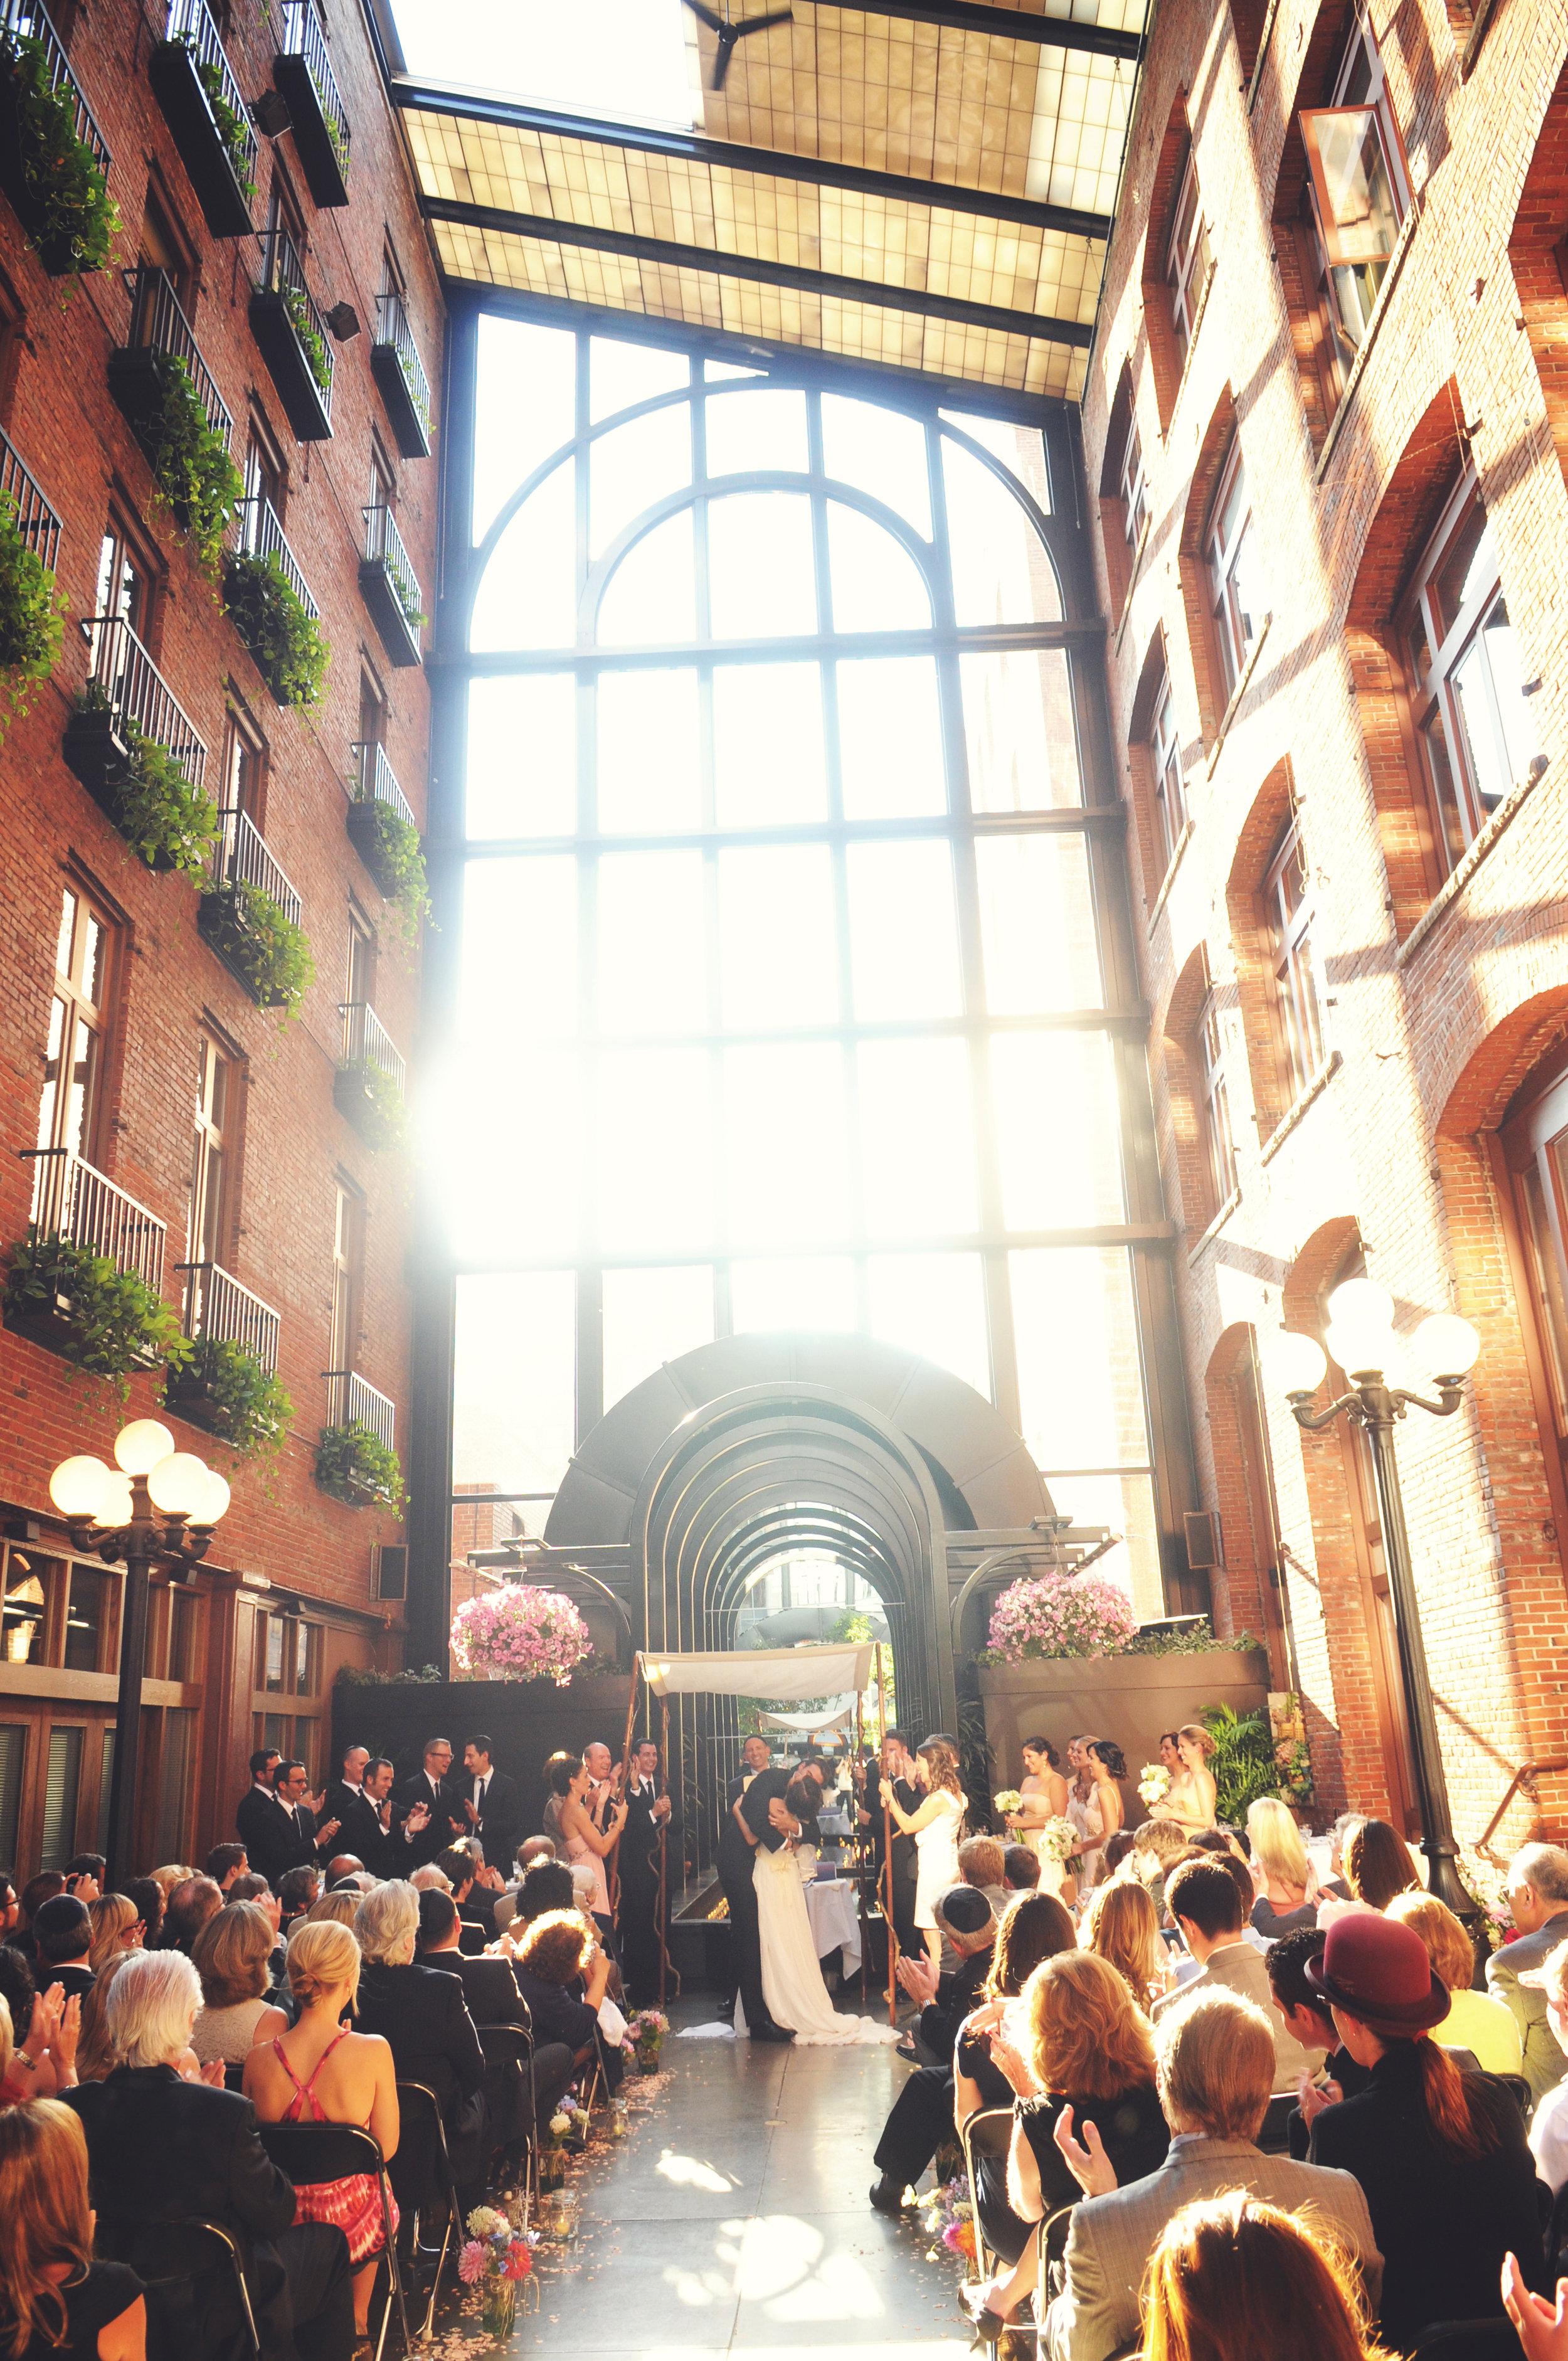 jkoe photography Meghan & Joe Downtown Seattle Wedding  (21) (1).jpg